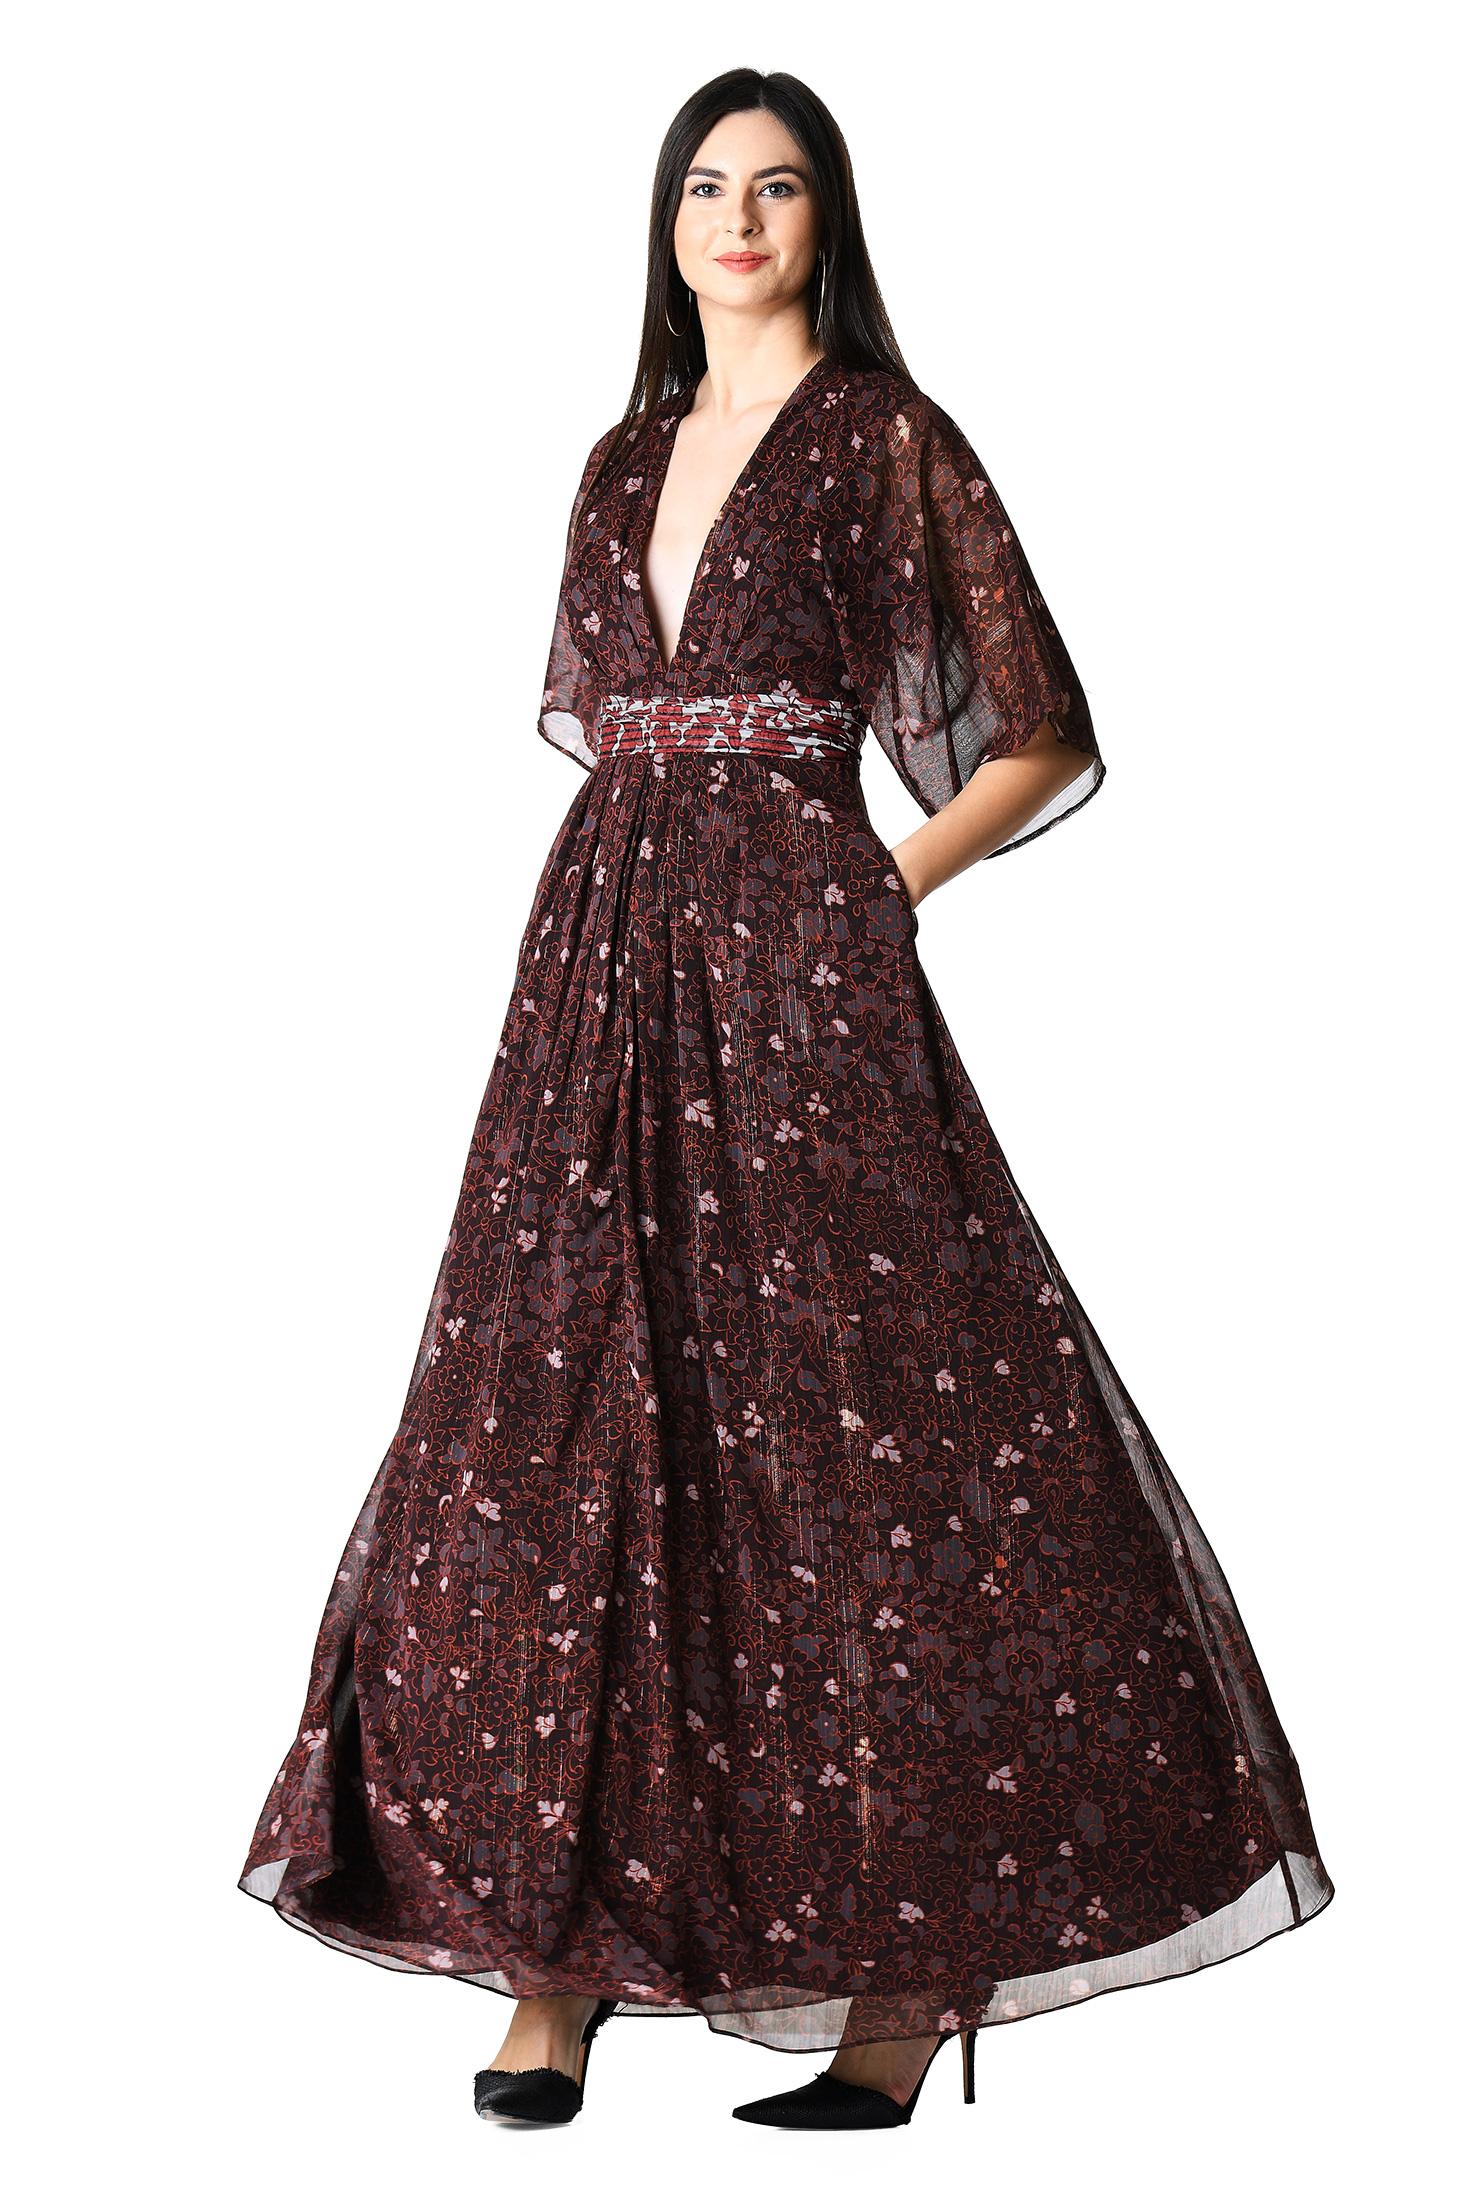 1b77b9f387ad Women s Fashion Clothing 0-36W and Custom